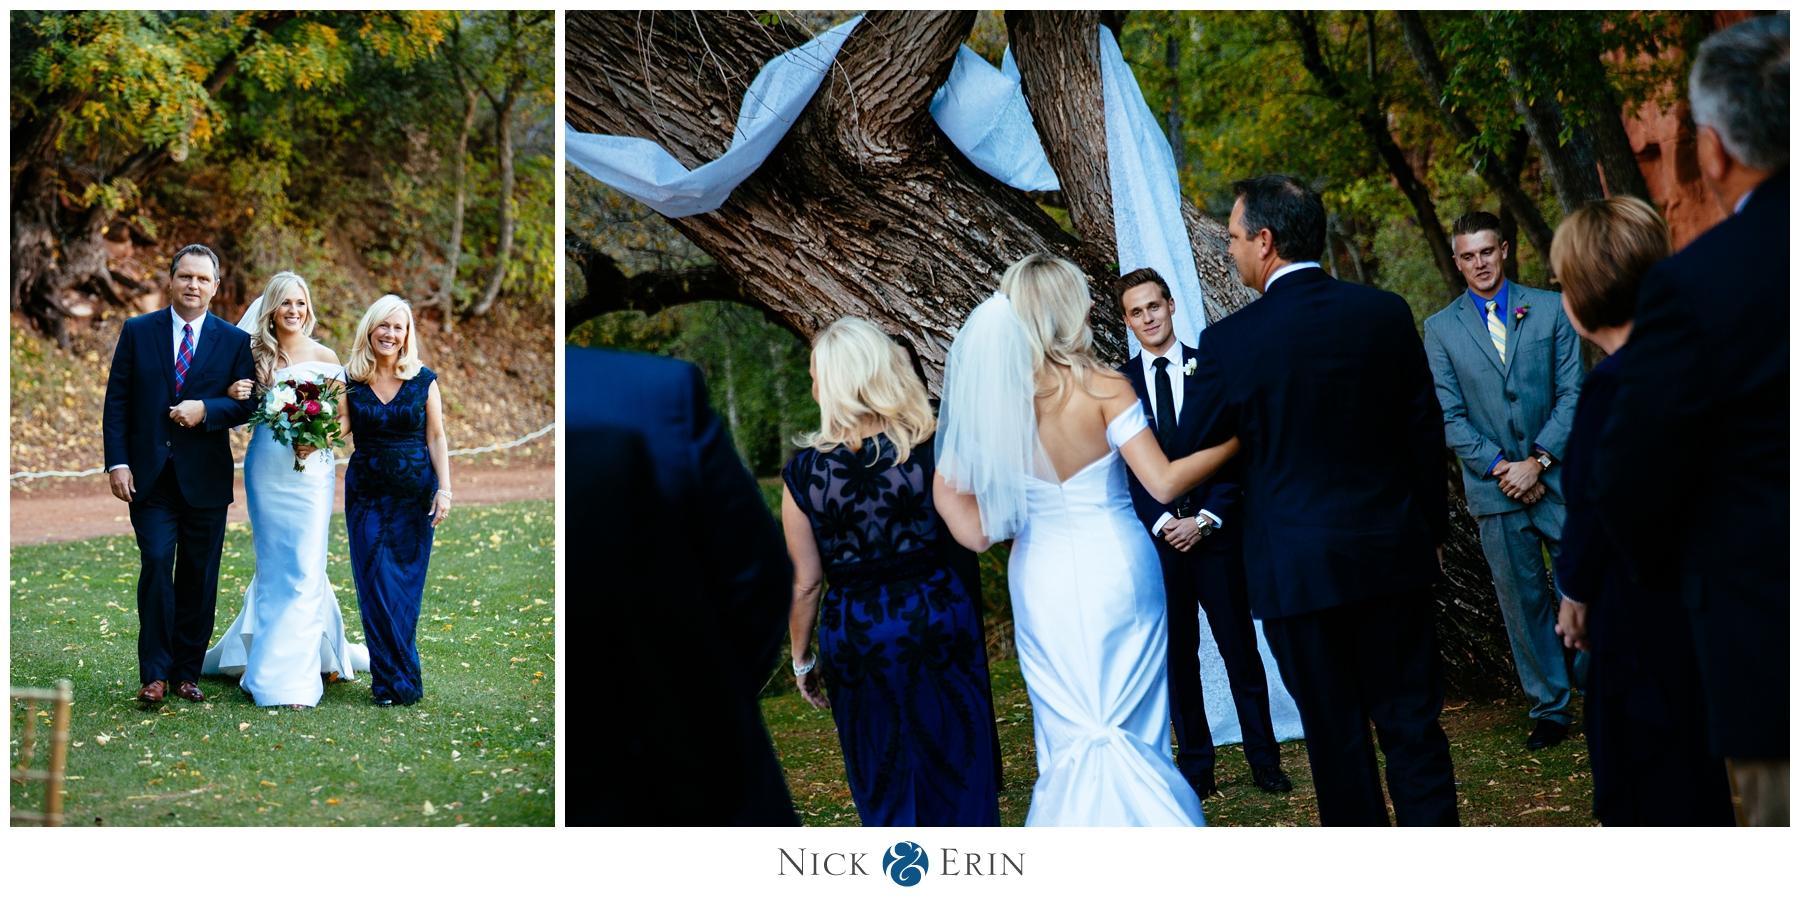 Donner_Photography_Sedona Arizona Wedding_Alissa and Tom_0039